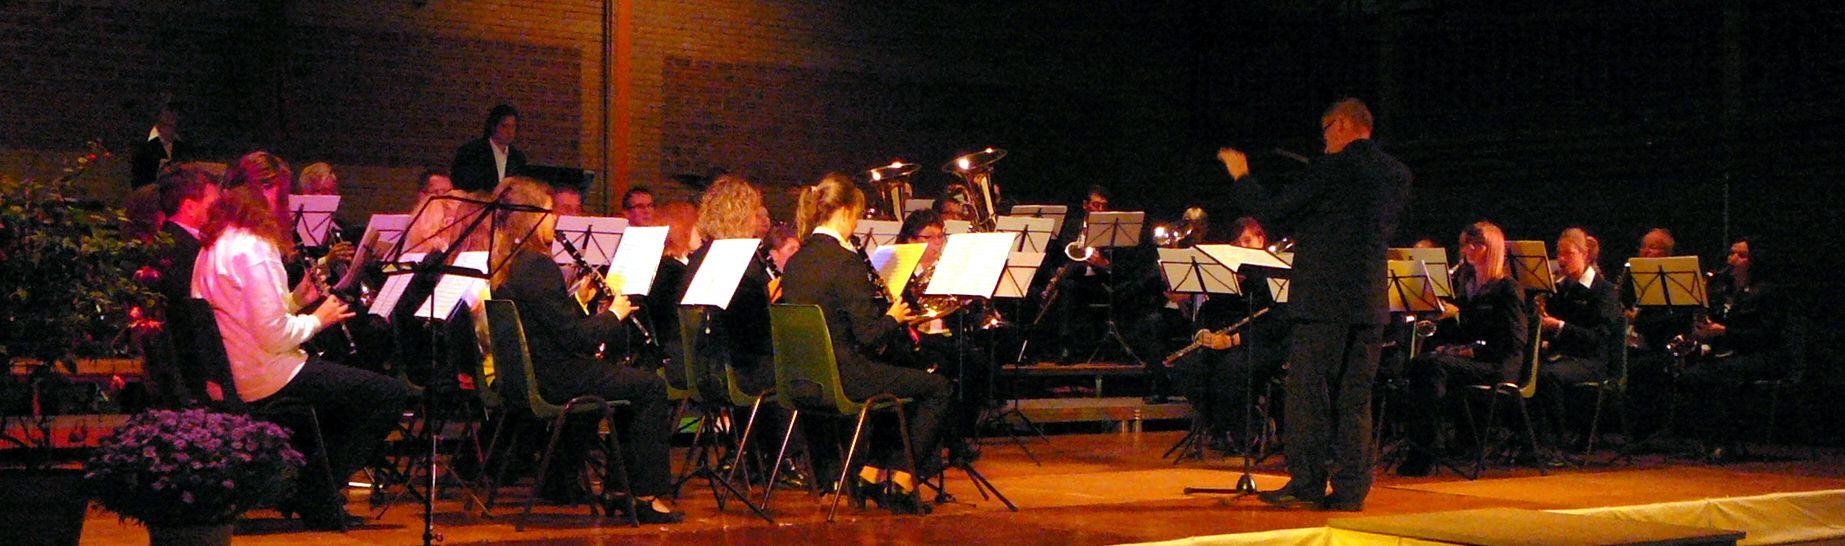 banner concert